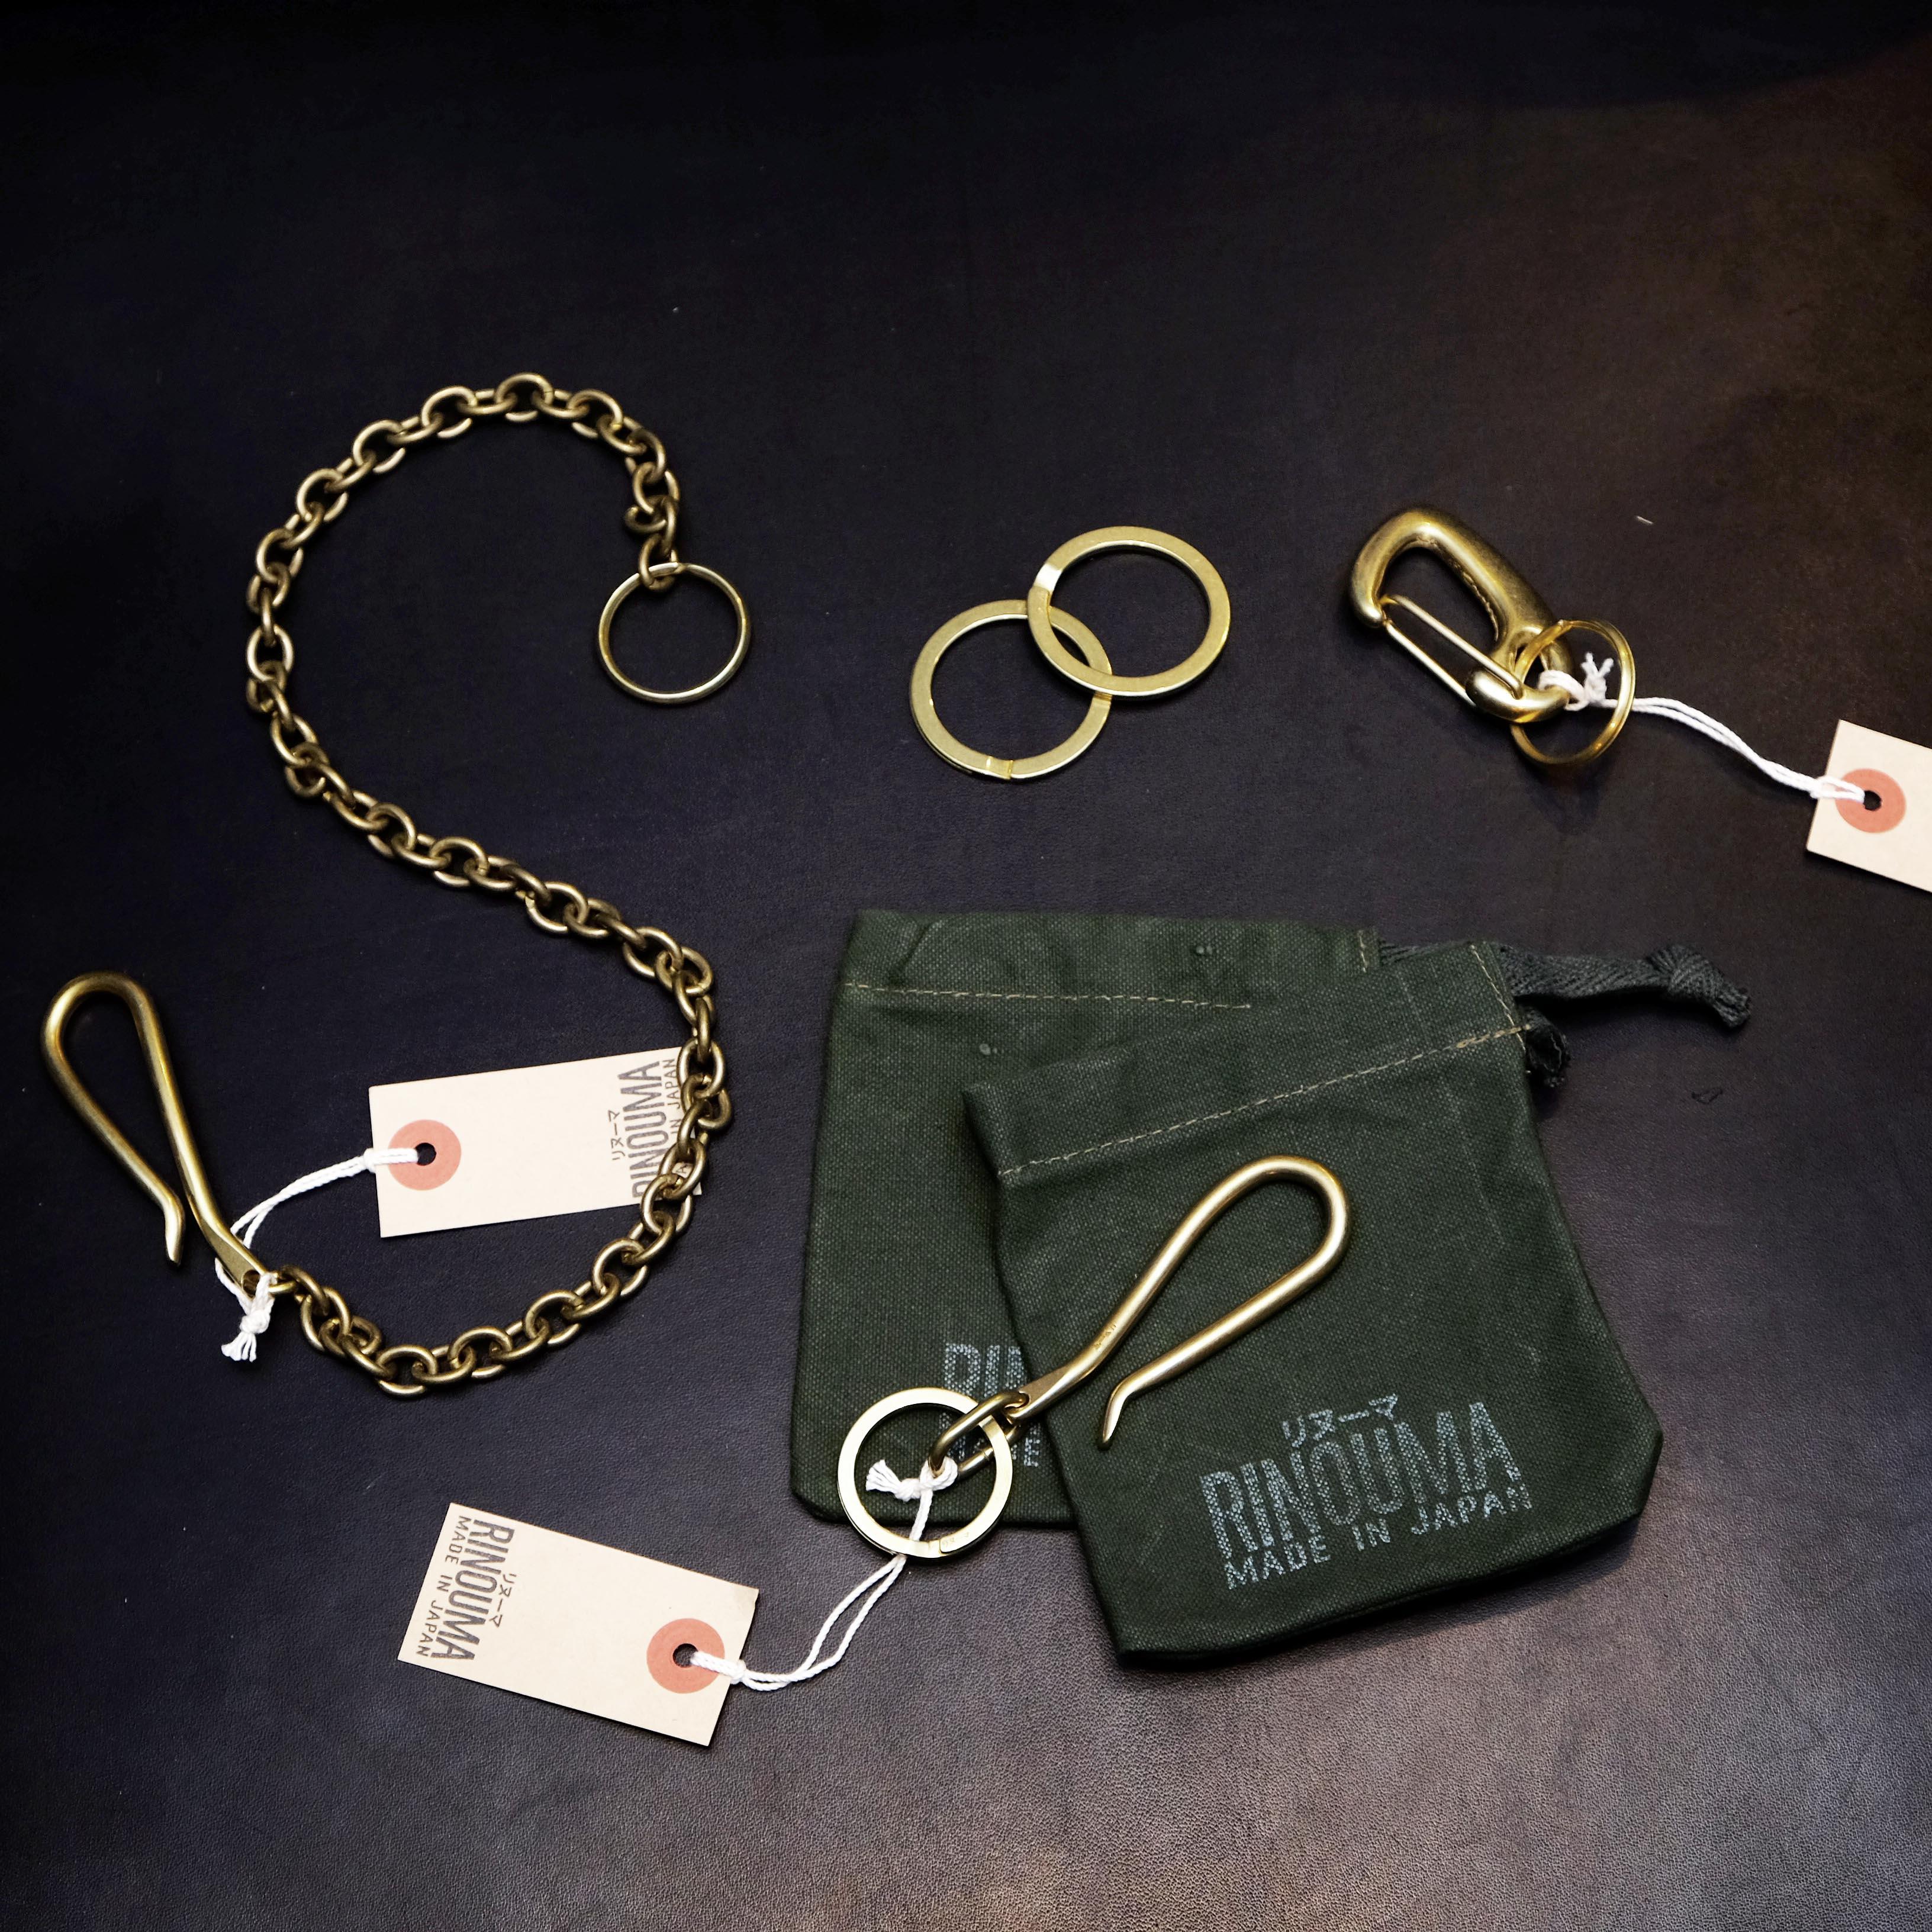 rinouma-messing-brass-schluesselanhaenger-accessoires